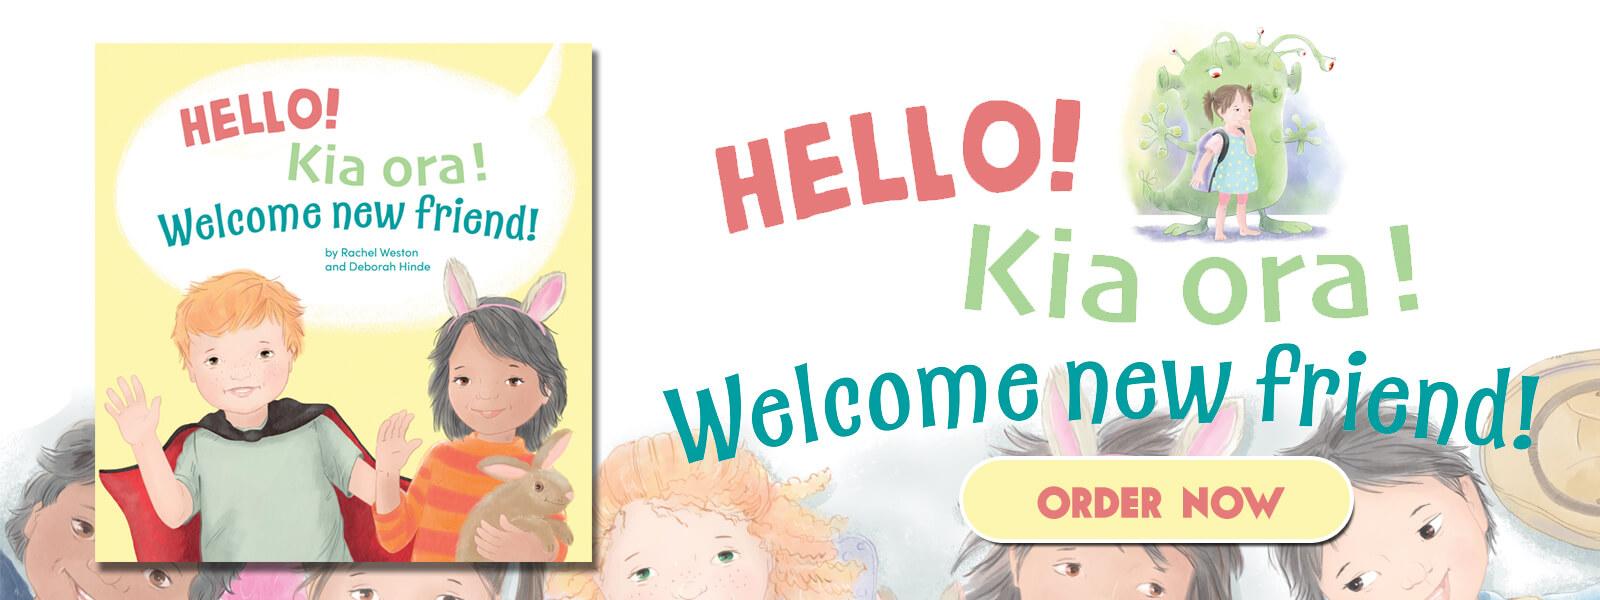 hello kia ora childrens book rachel weston